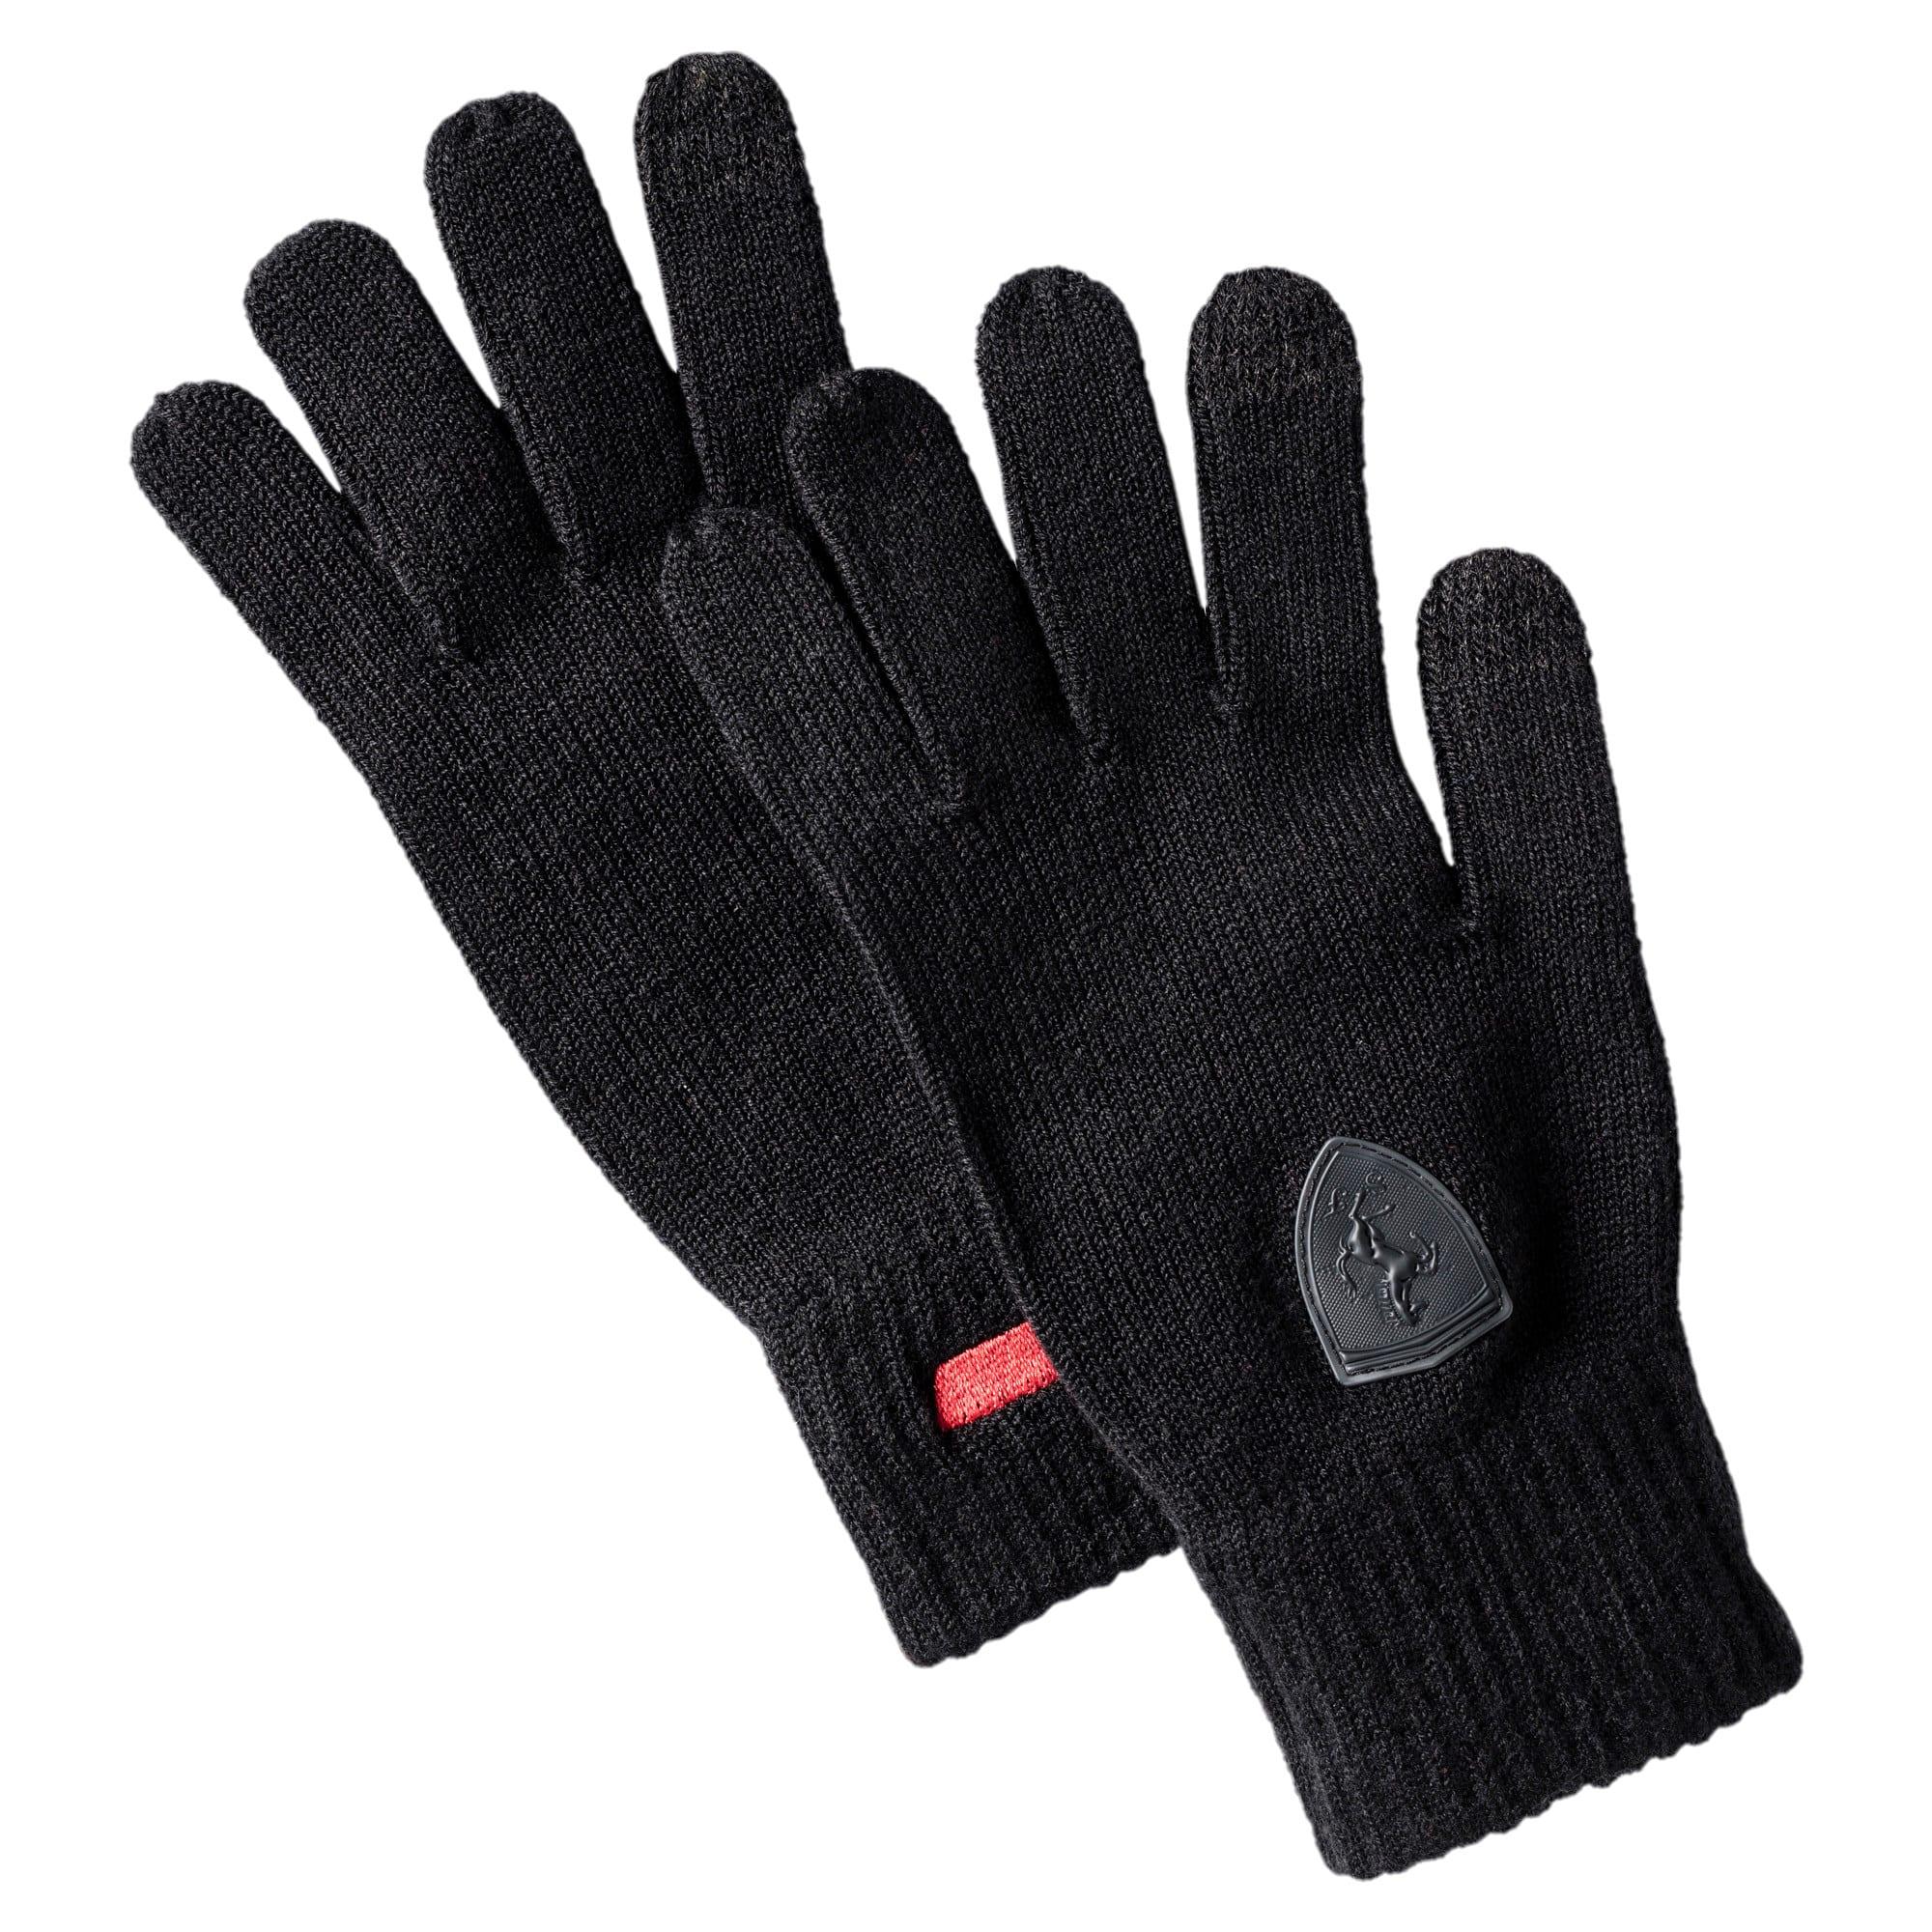 Thumbnail 1 of Ferrari Knit Gloves, Puma Black, medium-IND